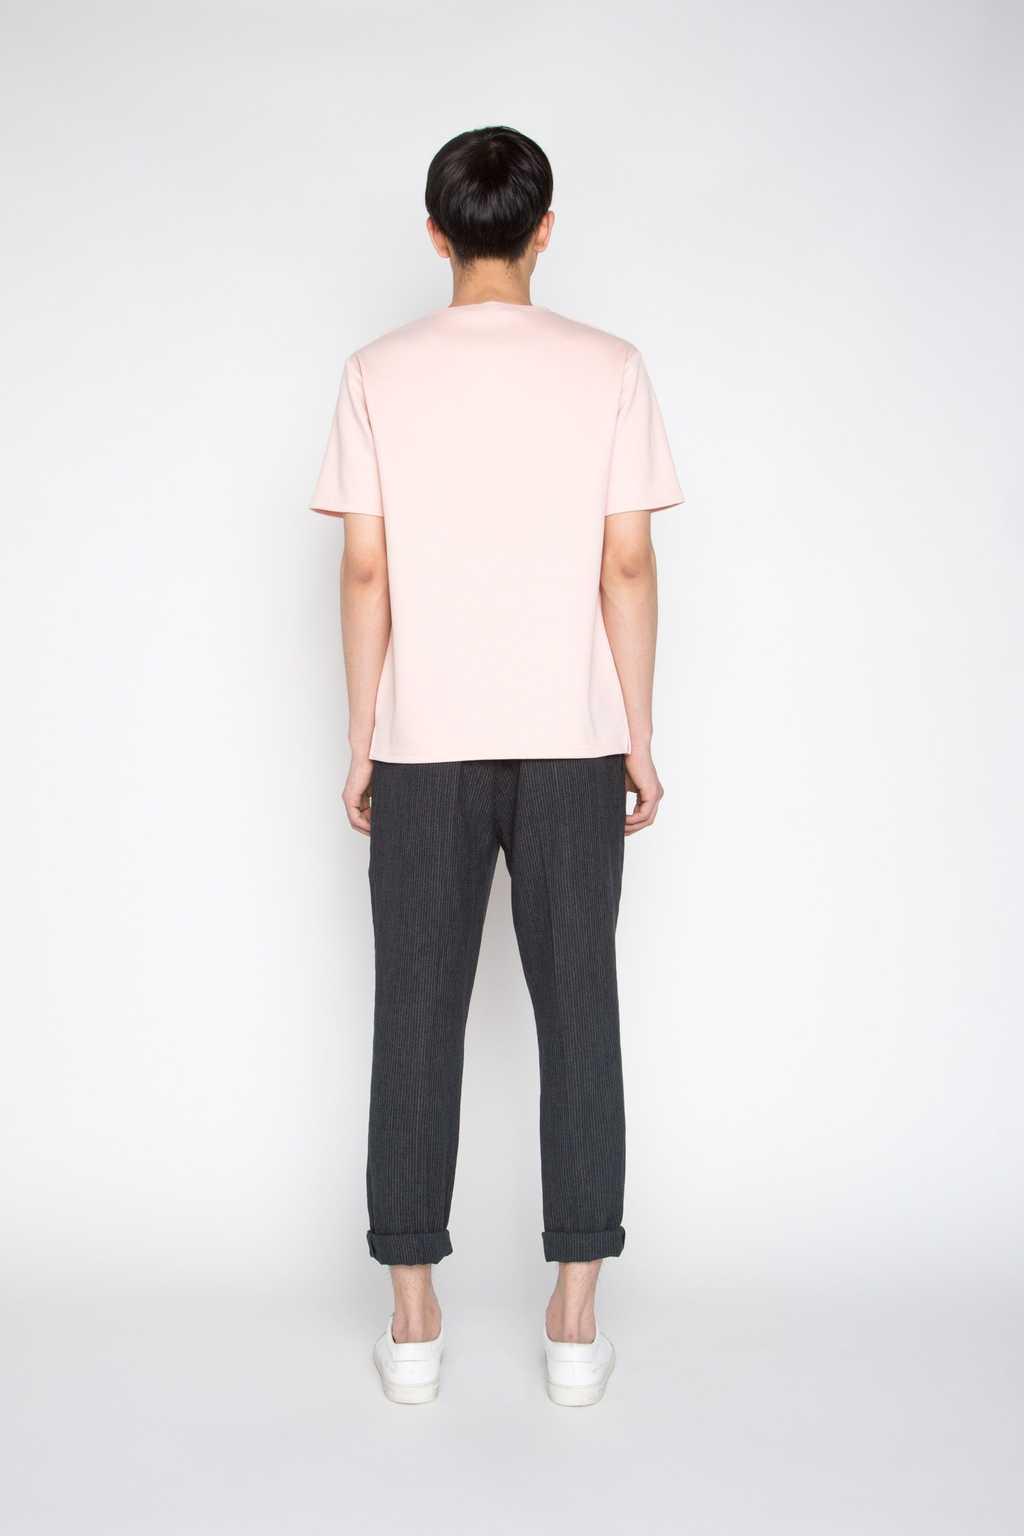 TShirt H031 Pink 4